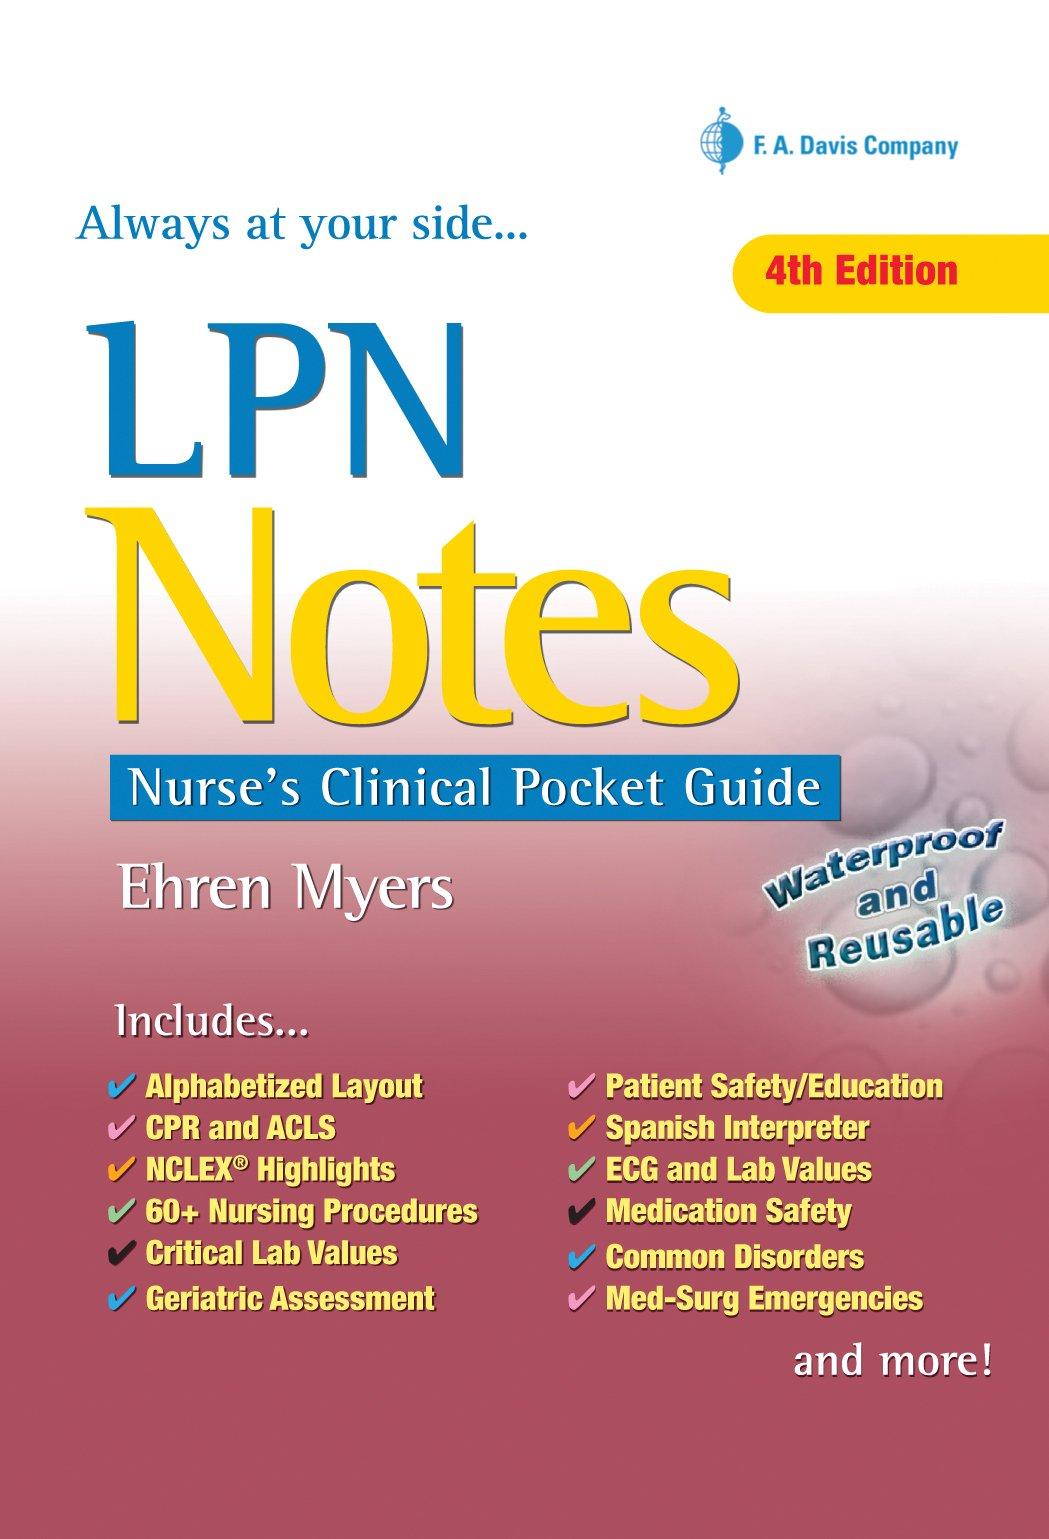 Lpn Notes Nurse S Clinical Pocket Guide Ehren Myers Rn